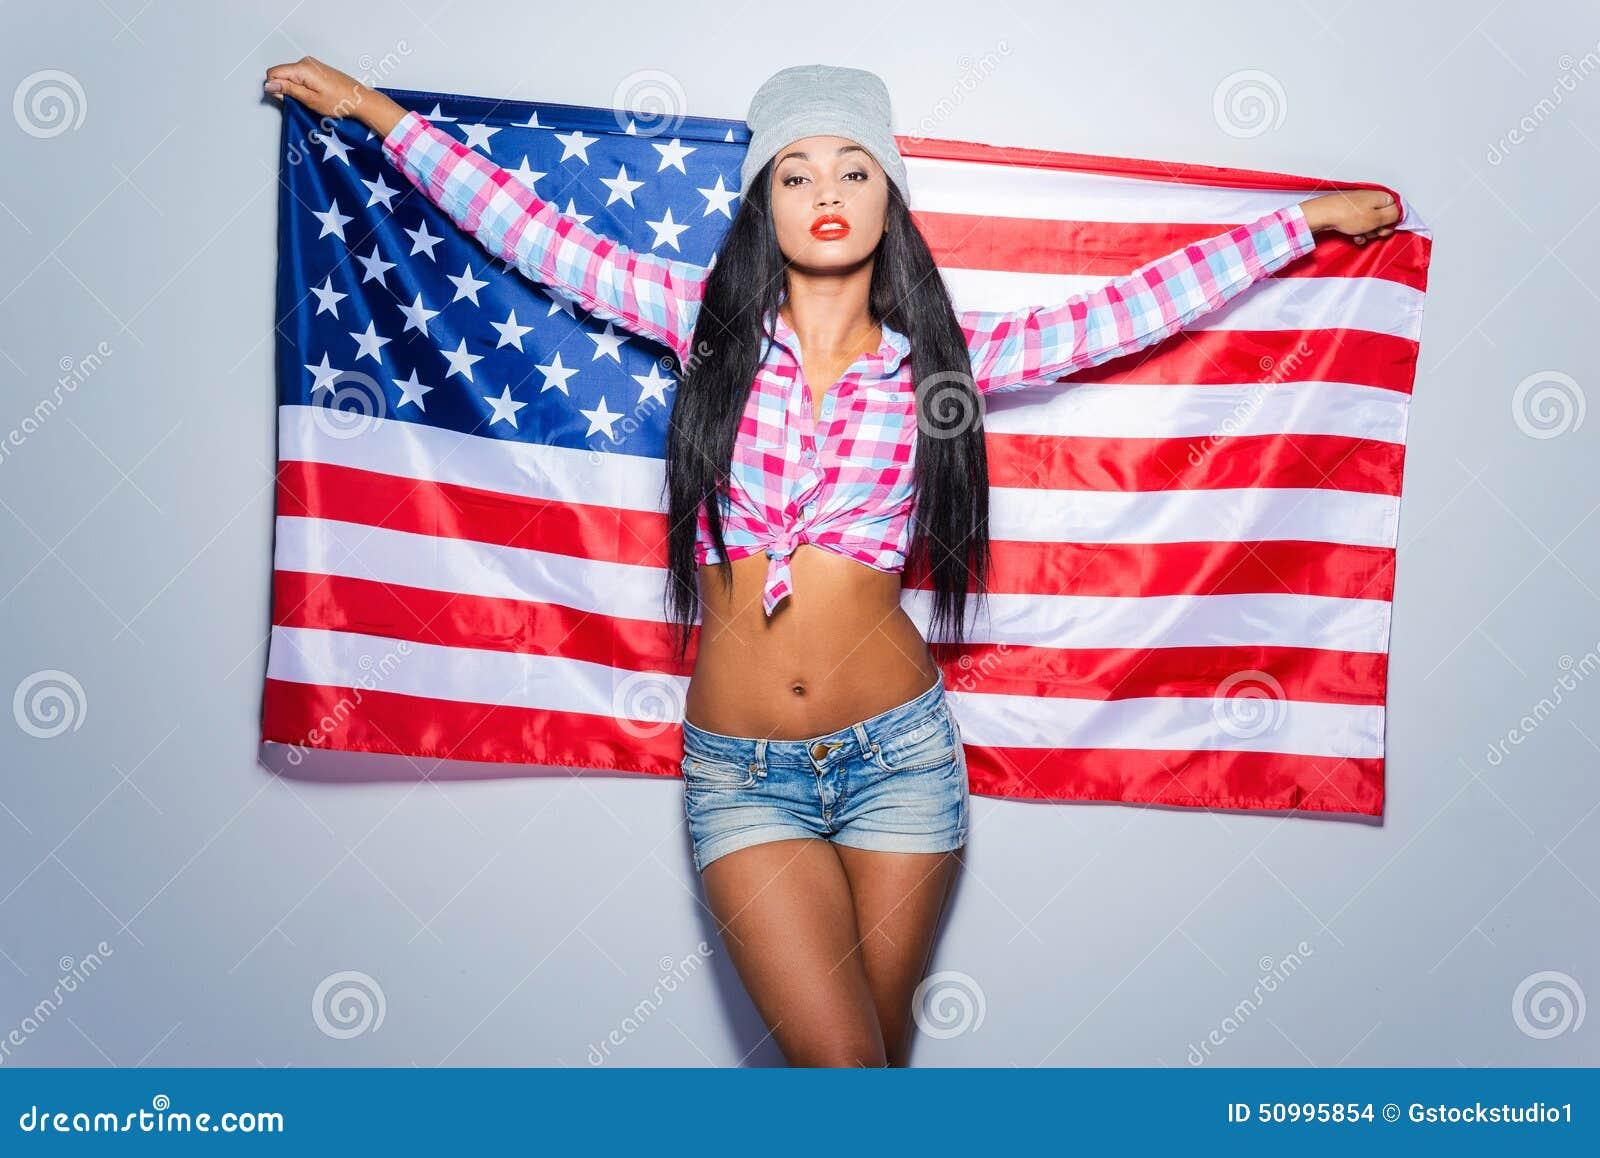 Американский флаг порно